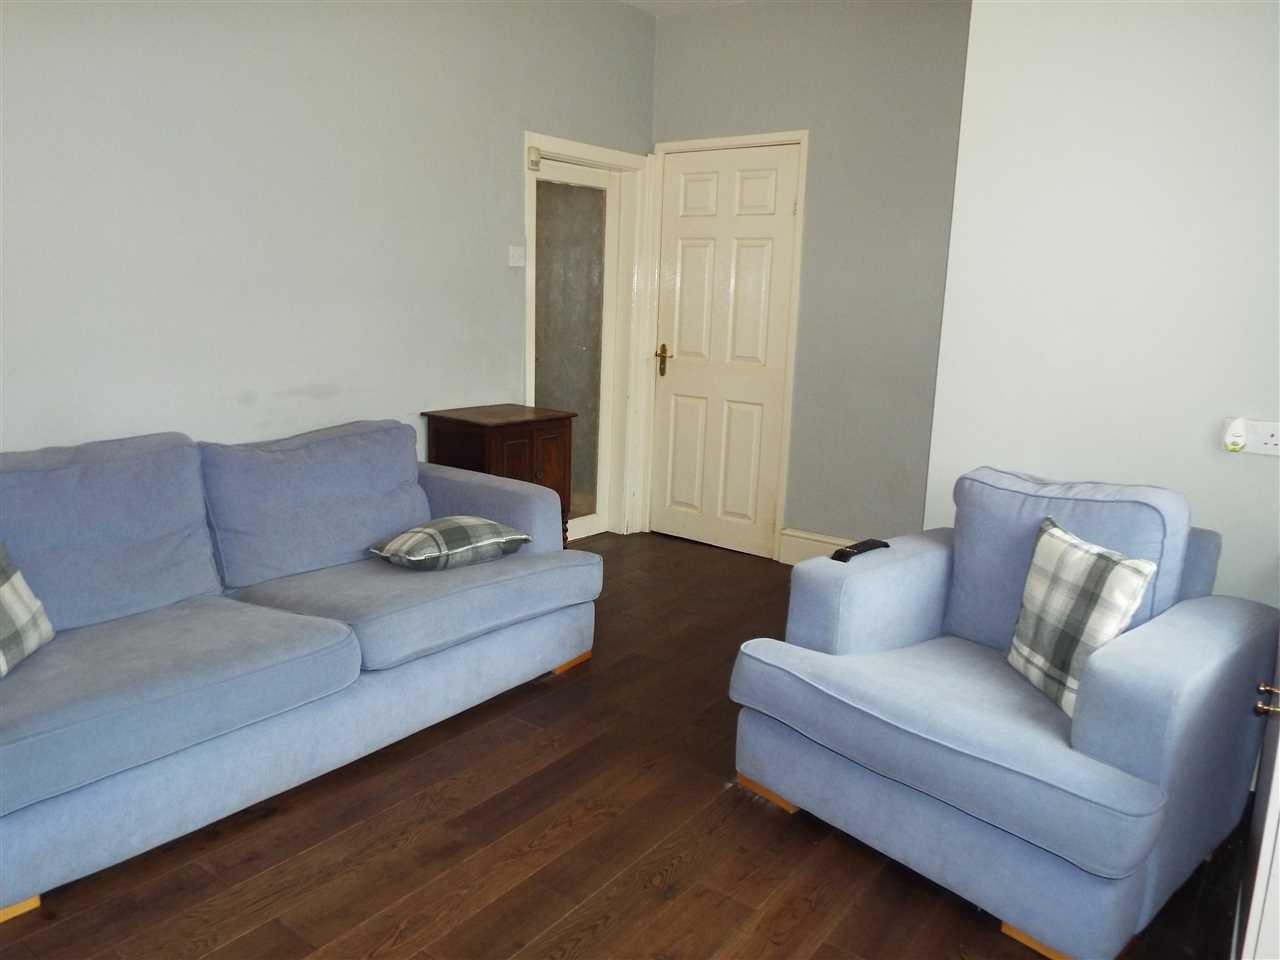 3 bed end-of-terrace for sale in Park Road, Adlington, Adlington 3